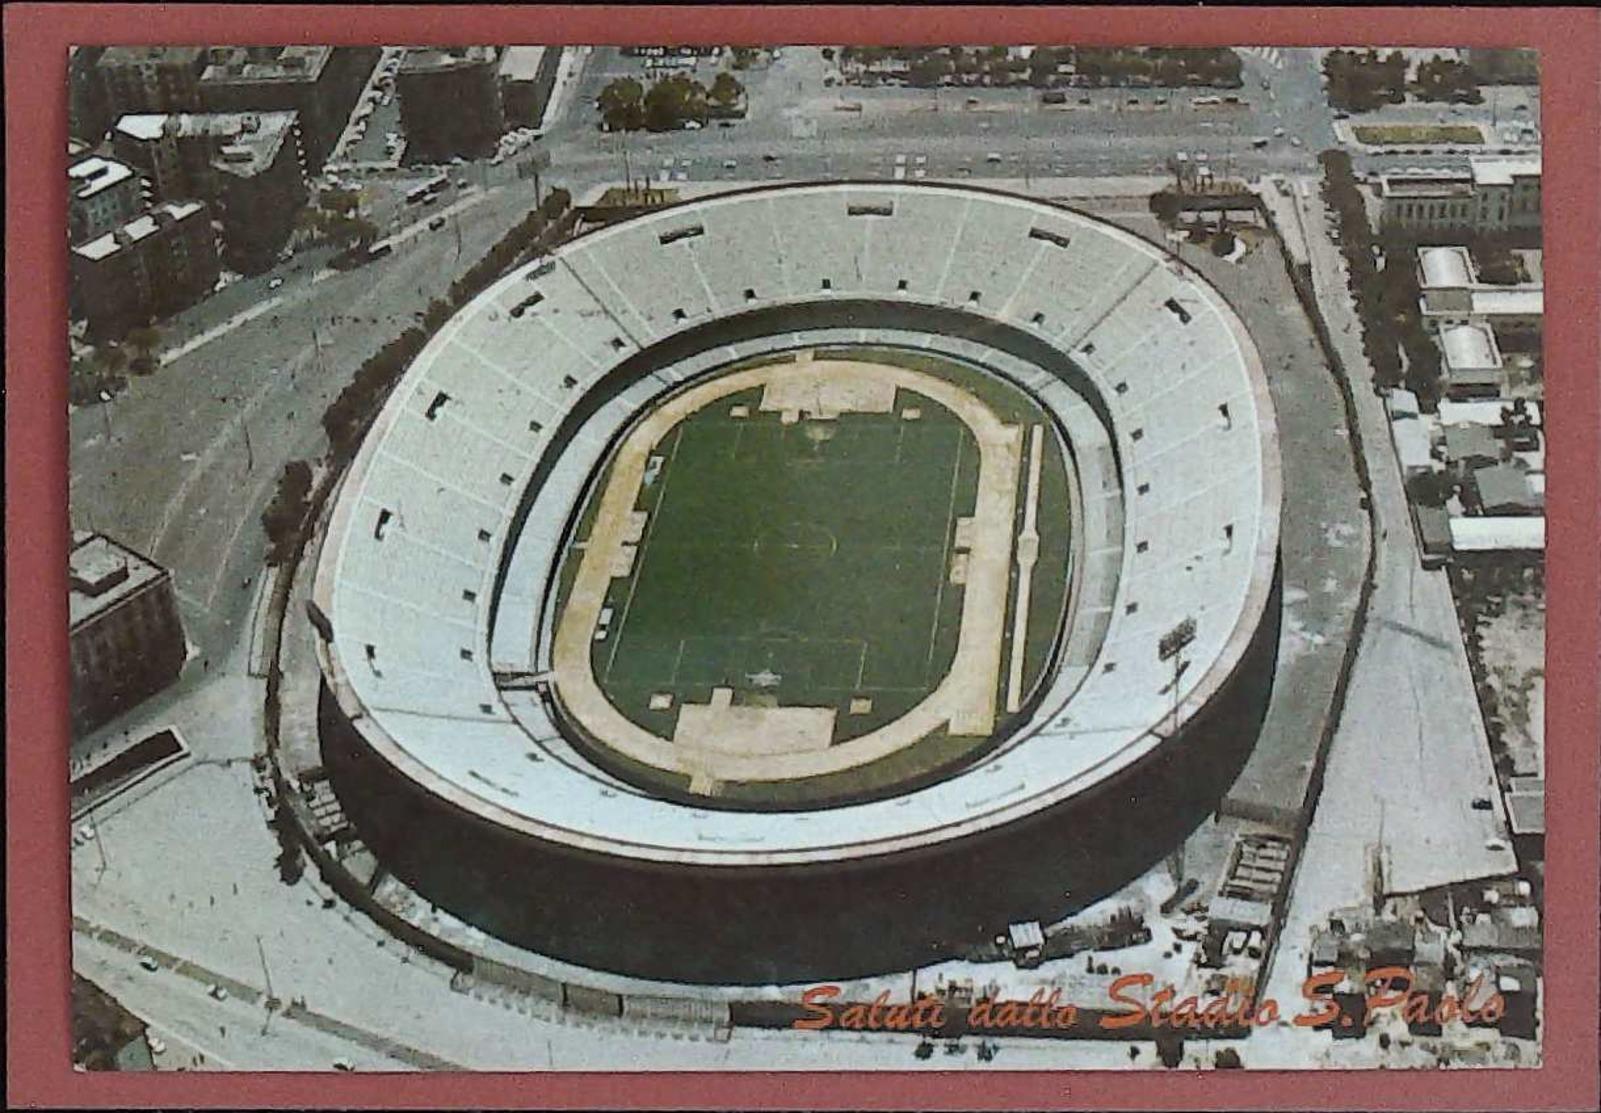 40 NAPOLI STADIO SAN PAOLO - ESTADIO – STADION – STADE – STADIUM – CAMPO SPORTIVO - Estadios